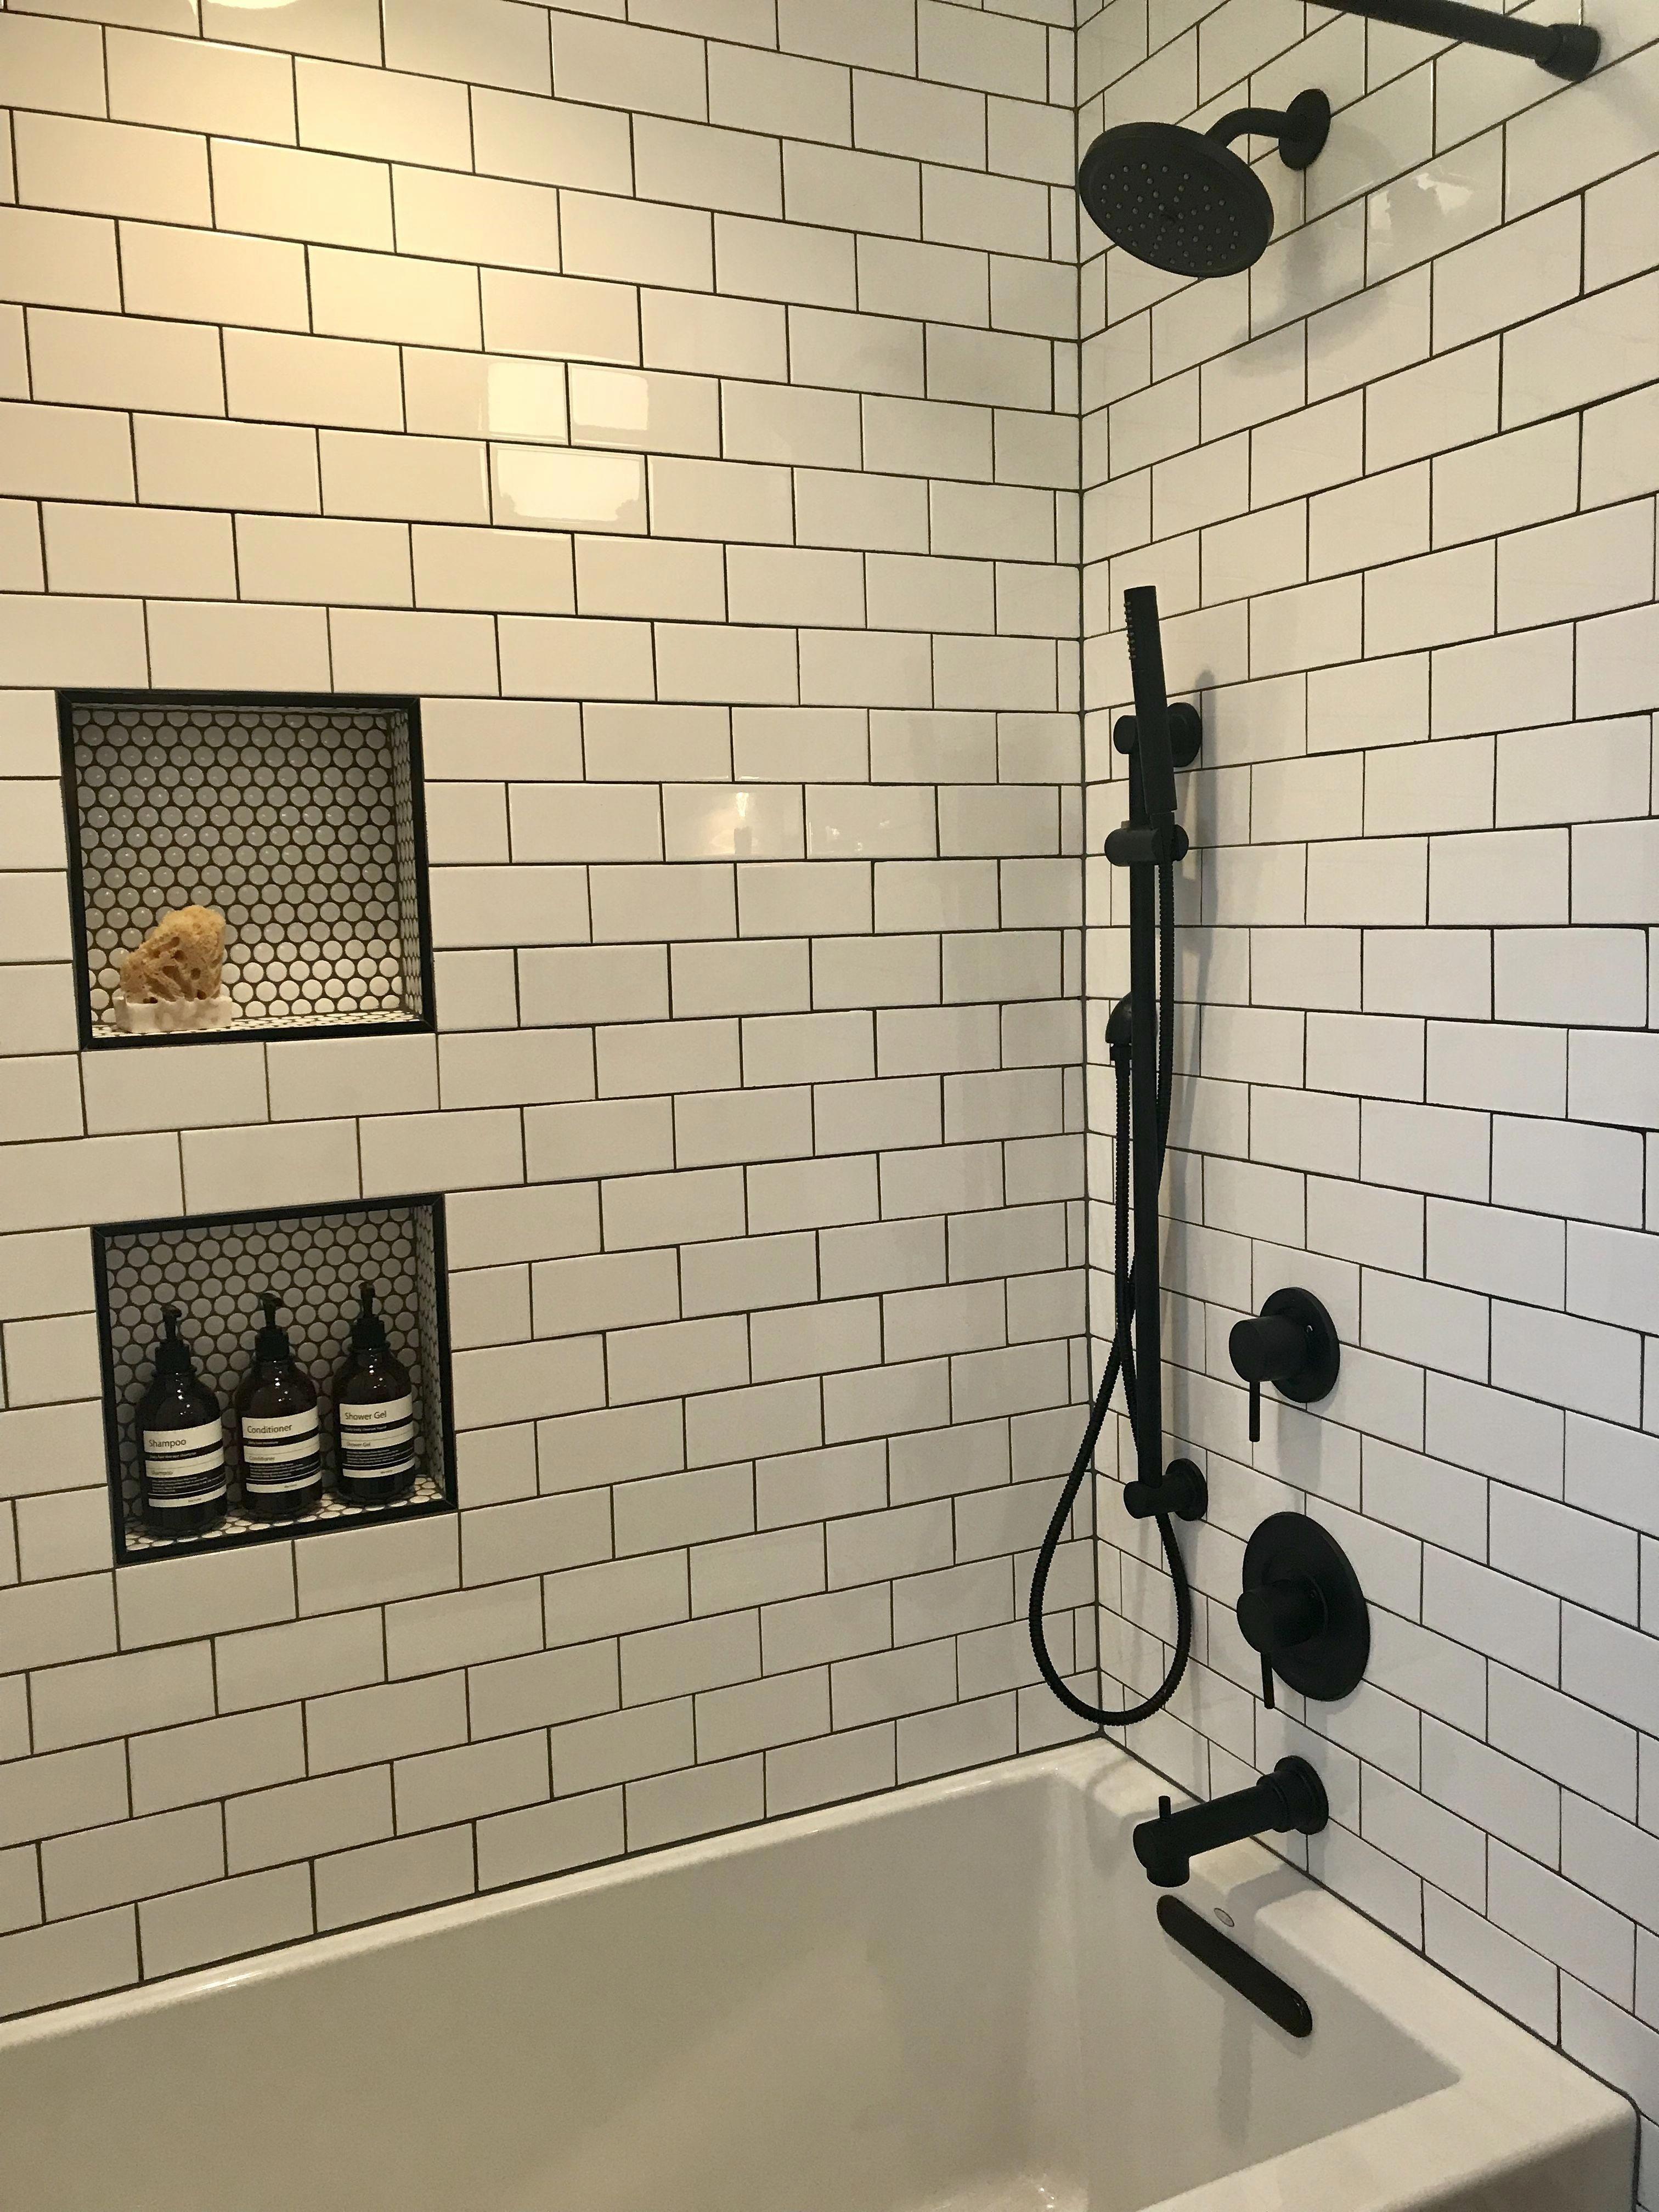 Kohler Soaking Tub Moen Matte Black Fixtures Bathroomshapessubwaytiles Bathroom Design Trends Bathroom Trends Bathrooms Remodel